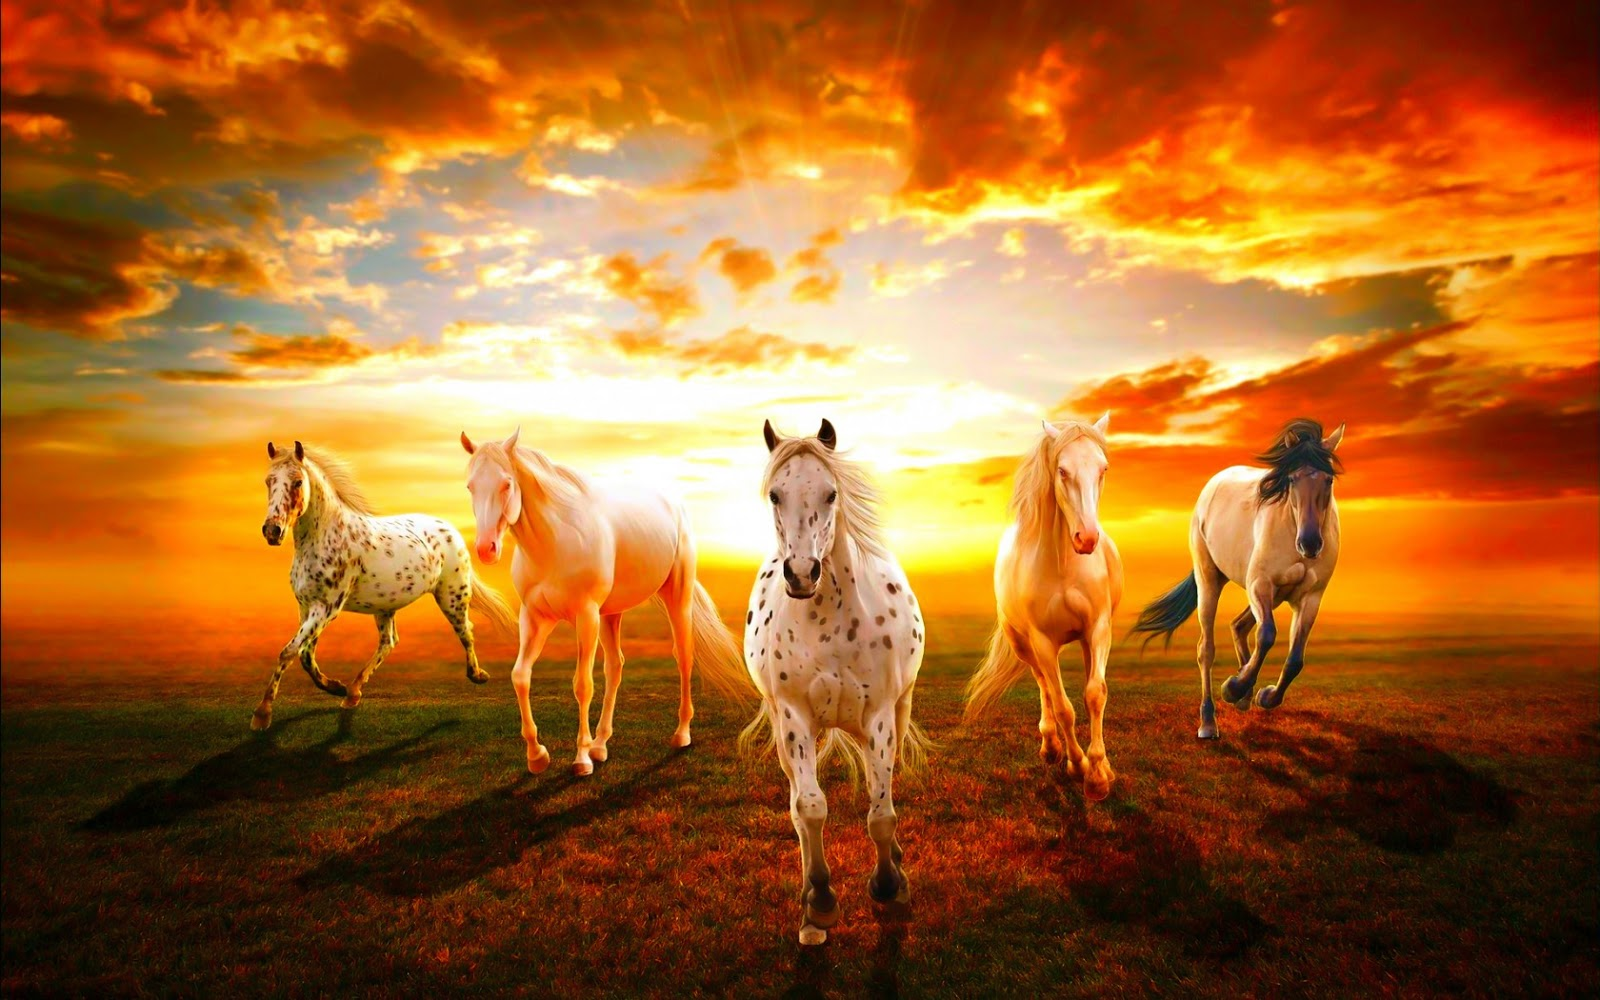 Free Download Wild Horses Hd Desktop Wallpaper 1600x1000 For